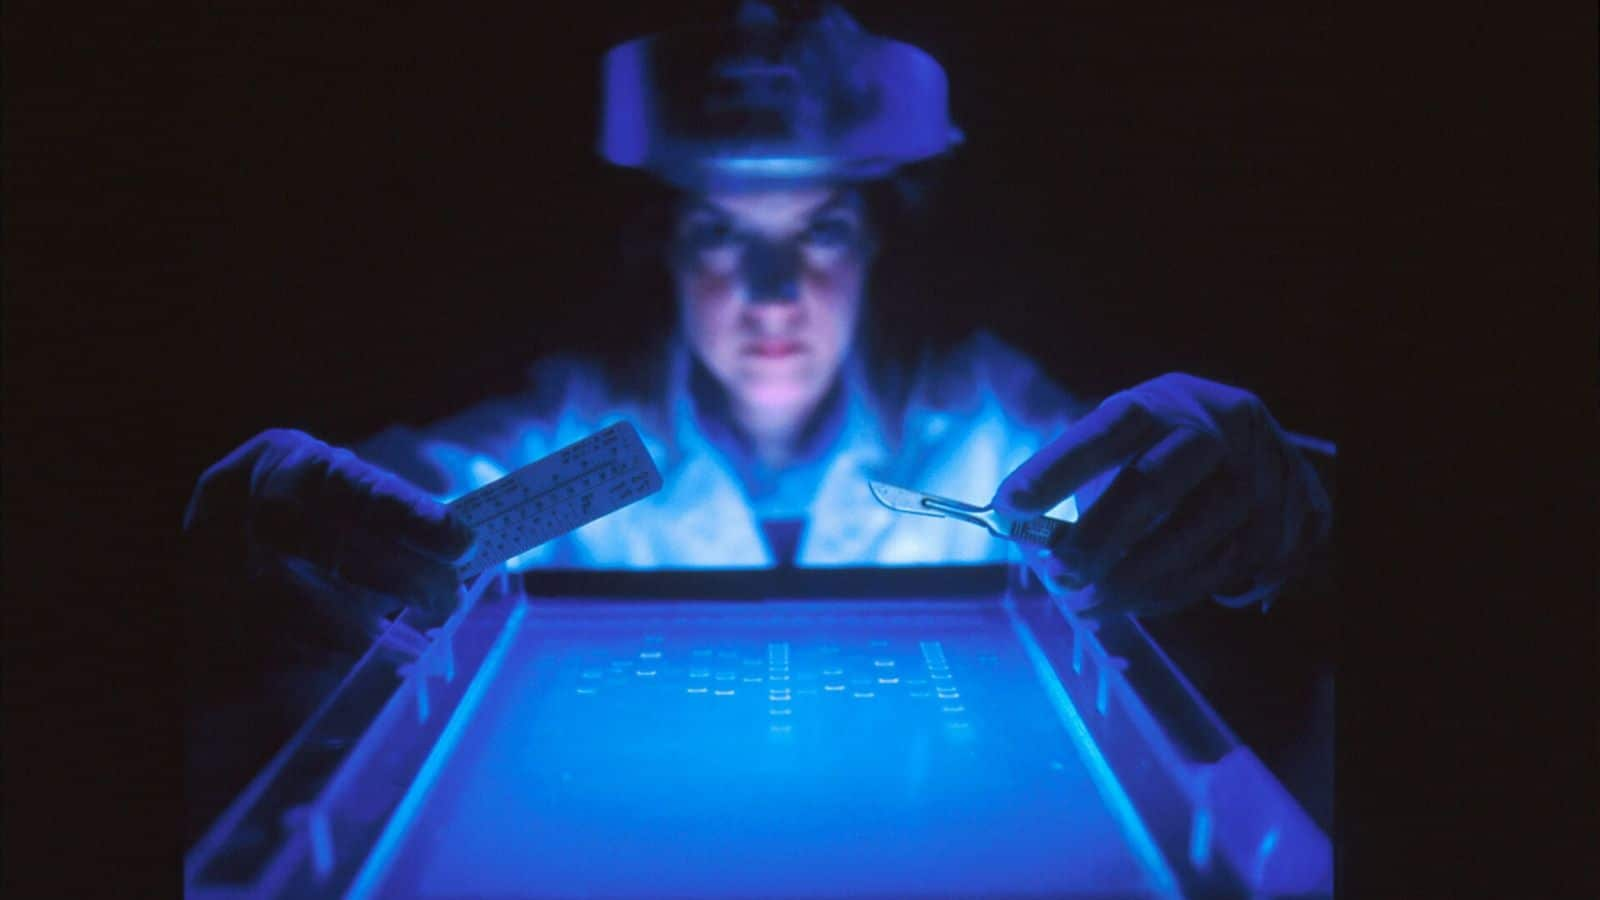 far-uvc lighting in labratory